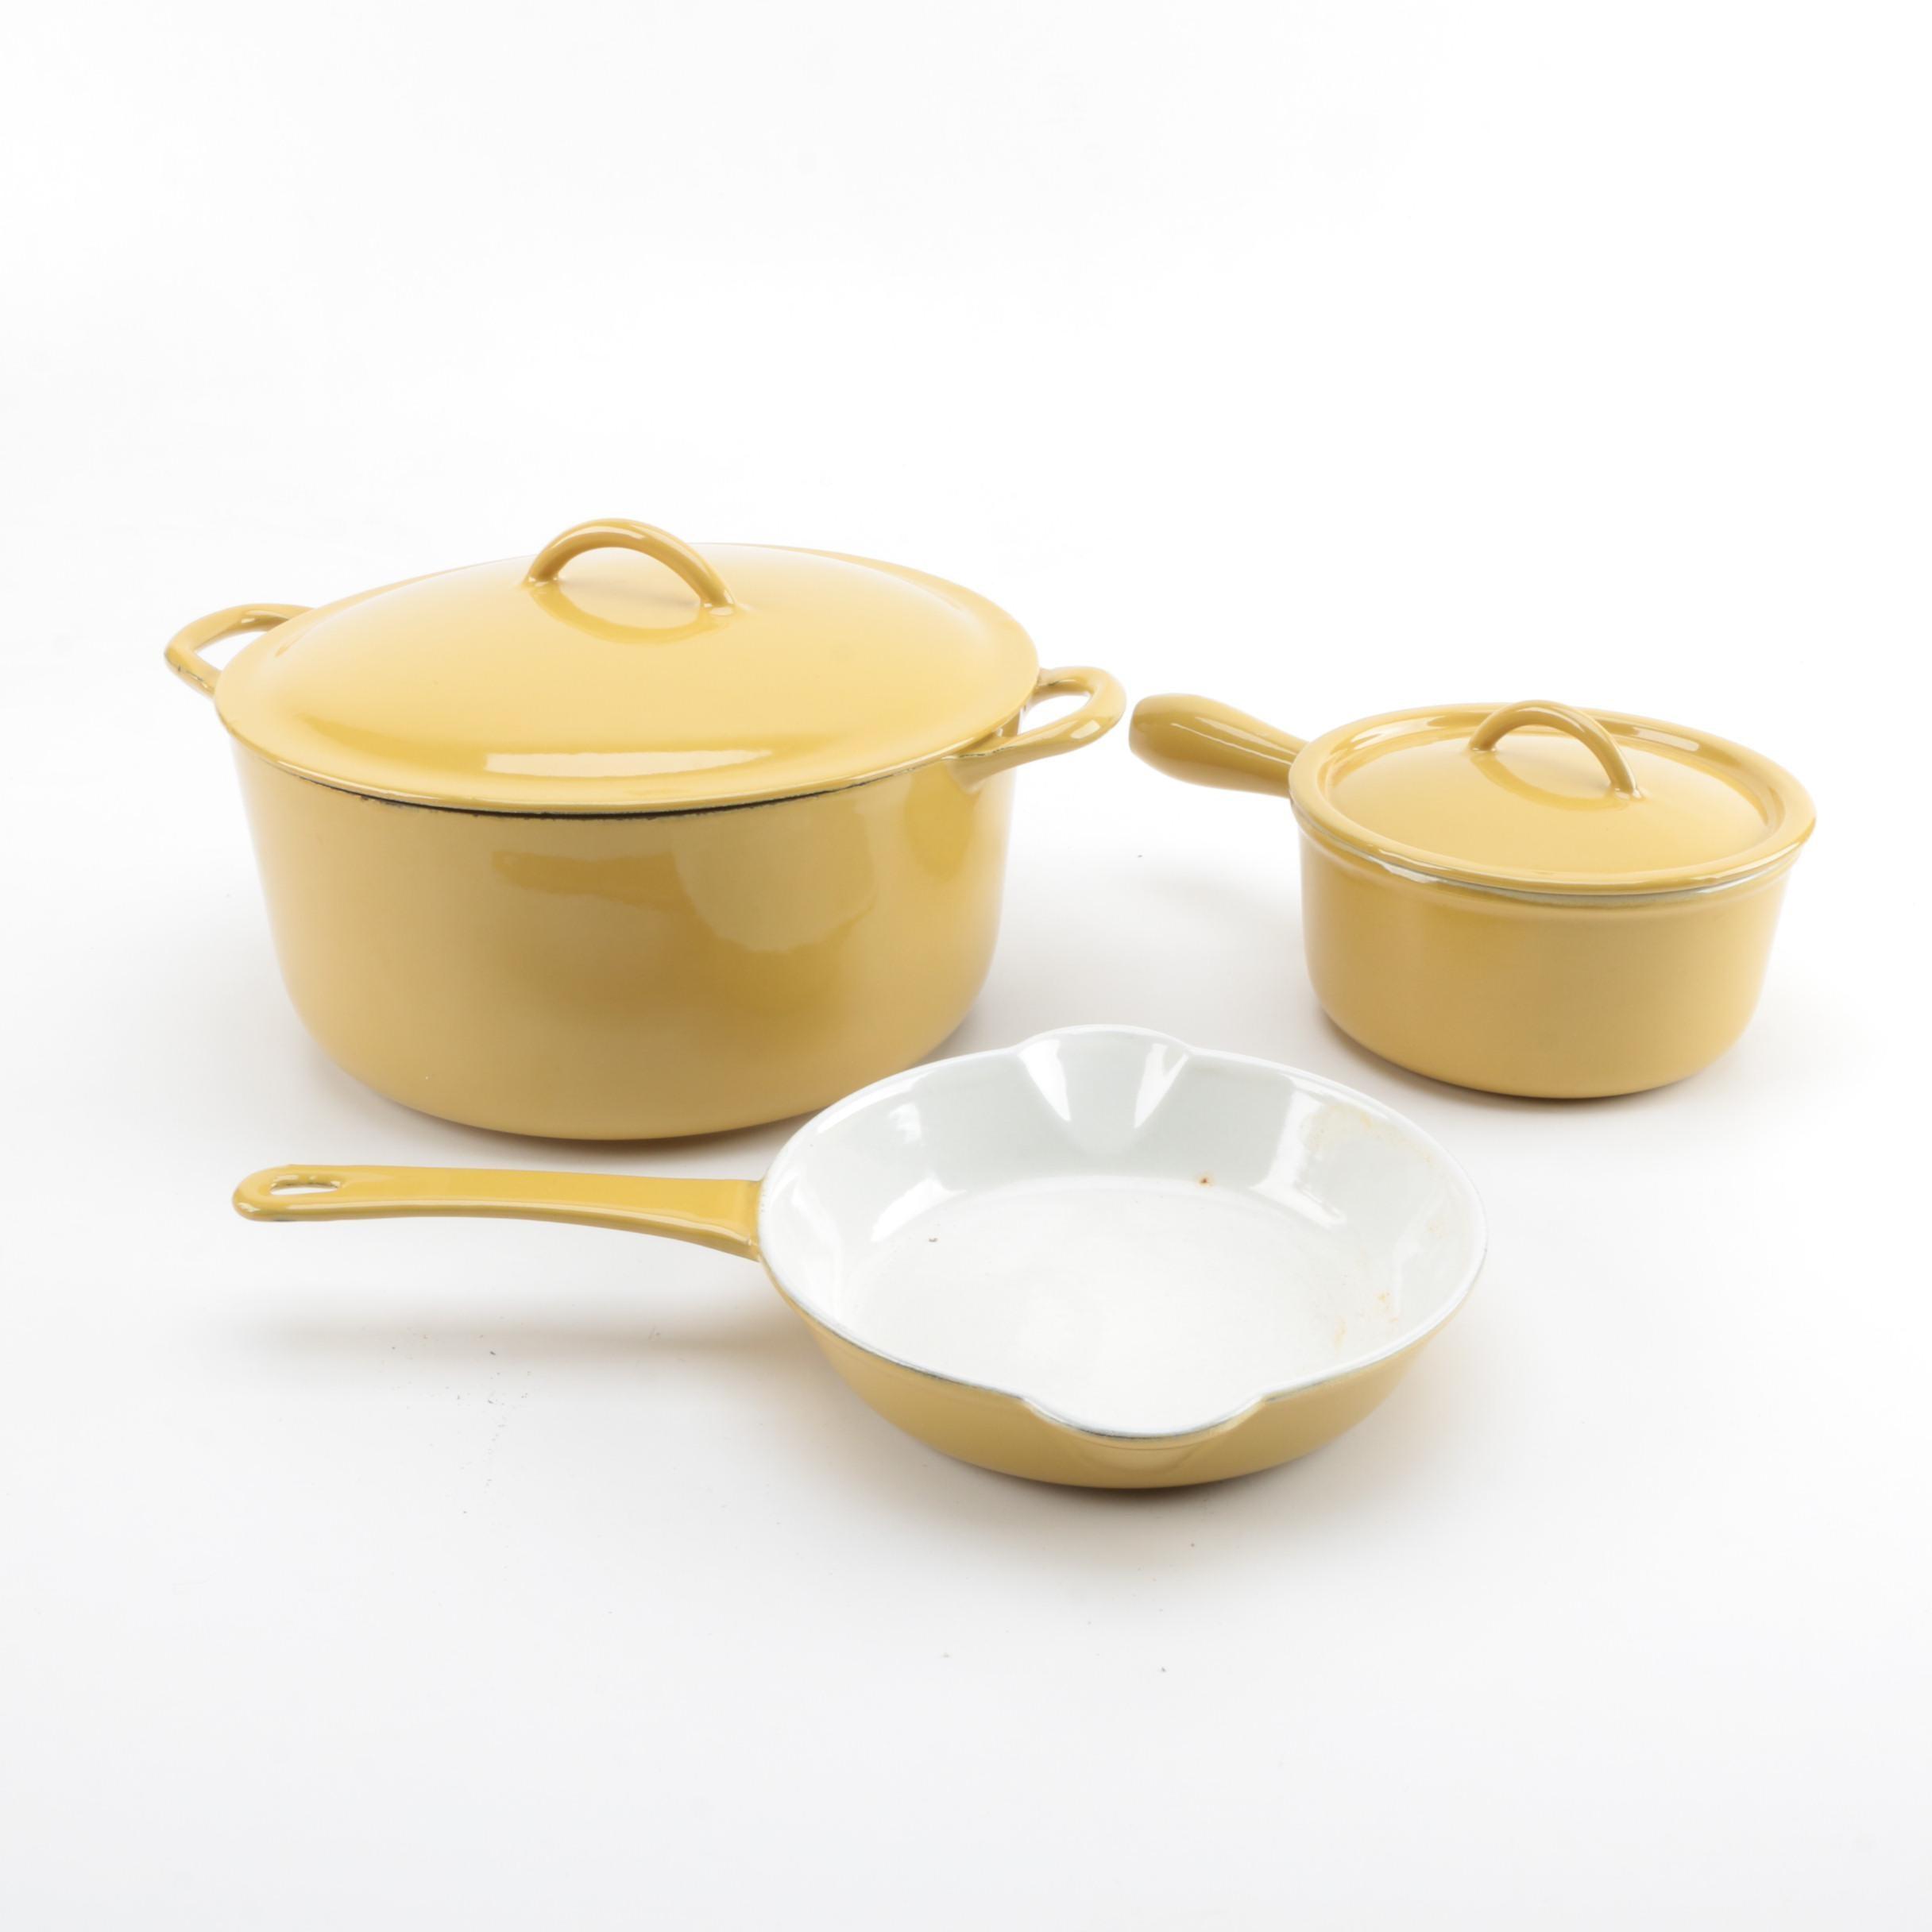 Vintage Descoware Cookware